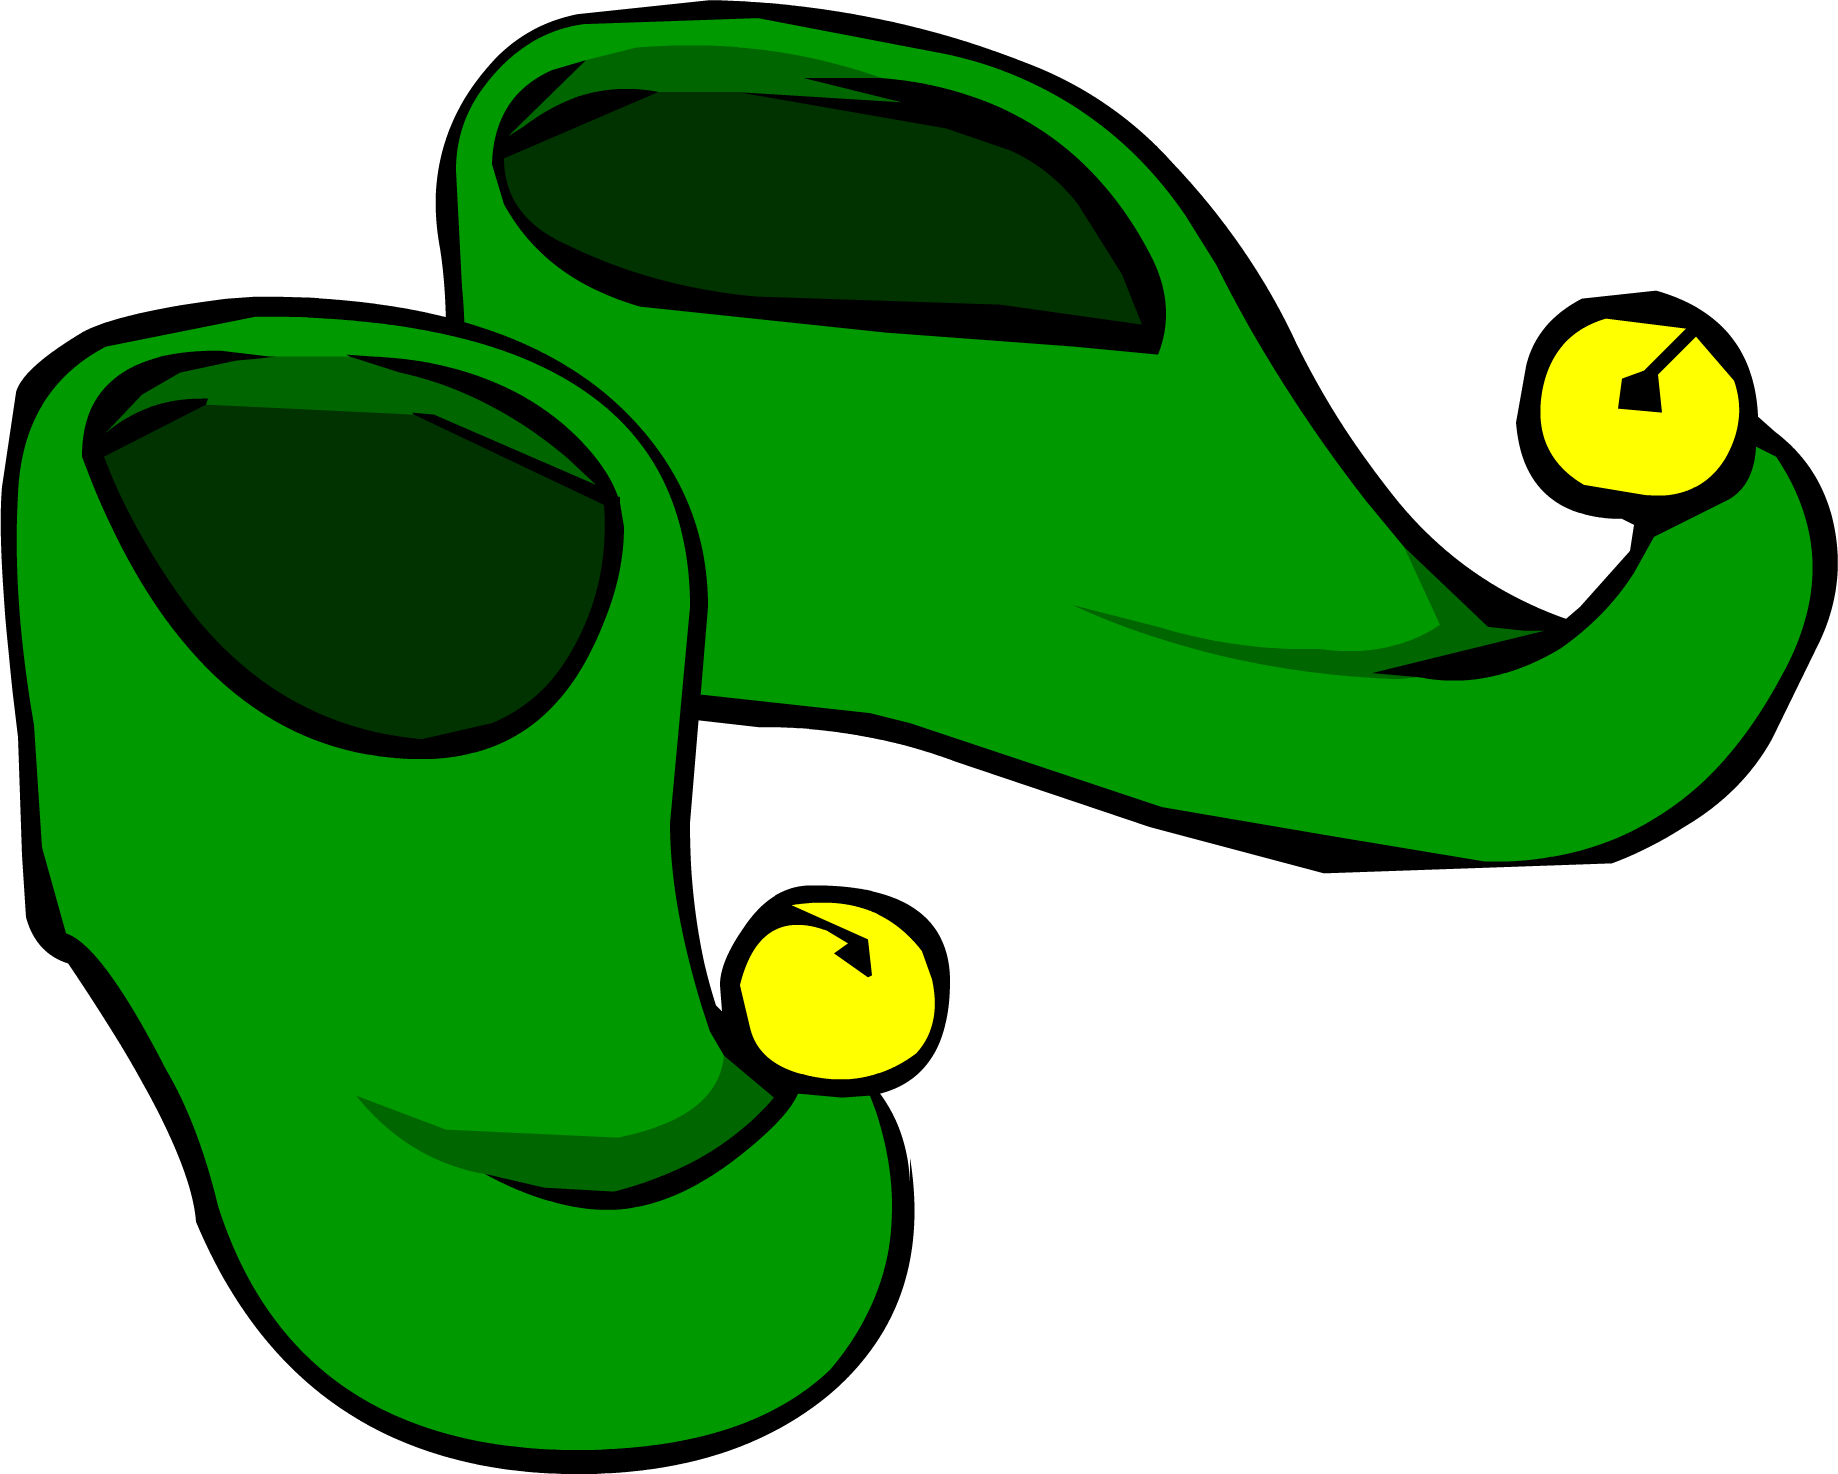 elf shoes club penguin wiki fandom powered by wikia